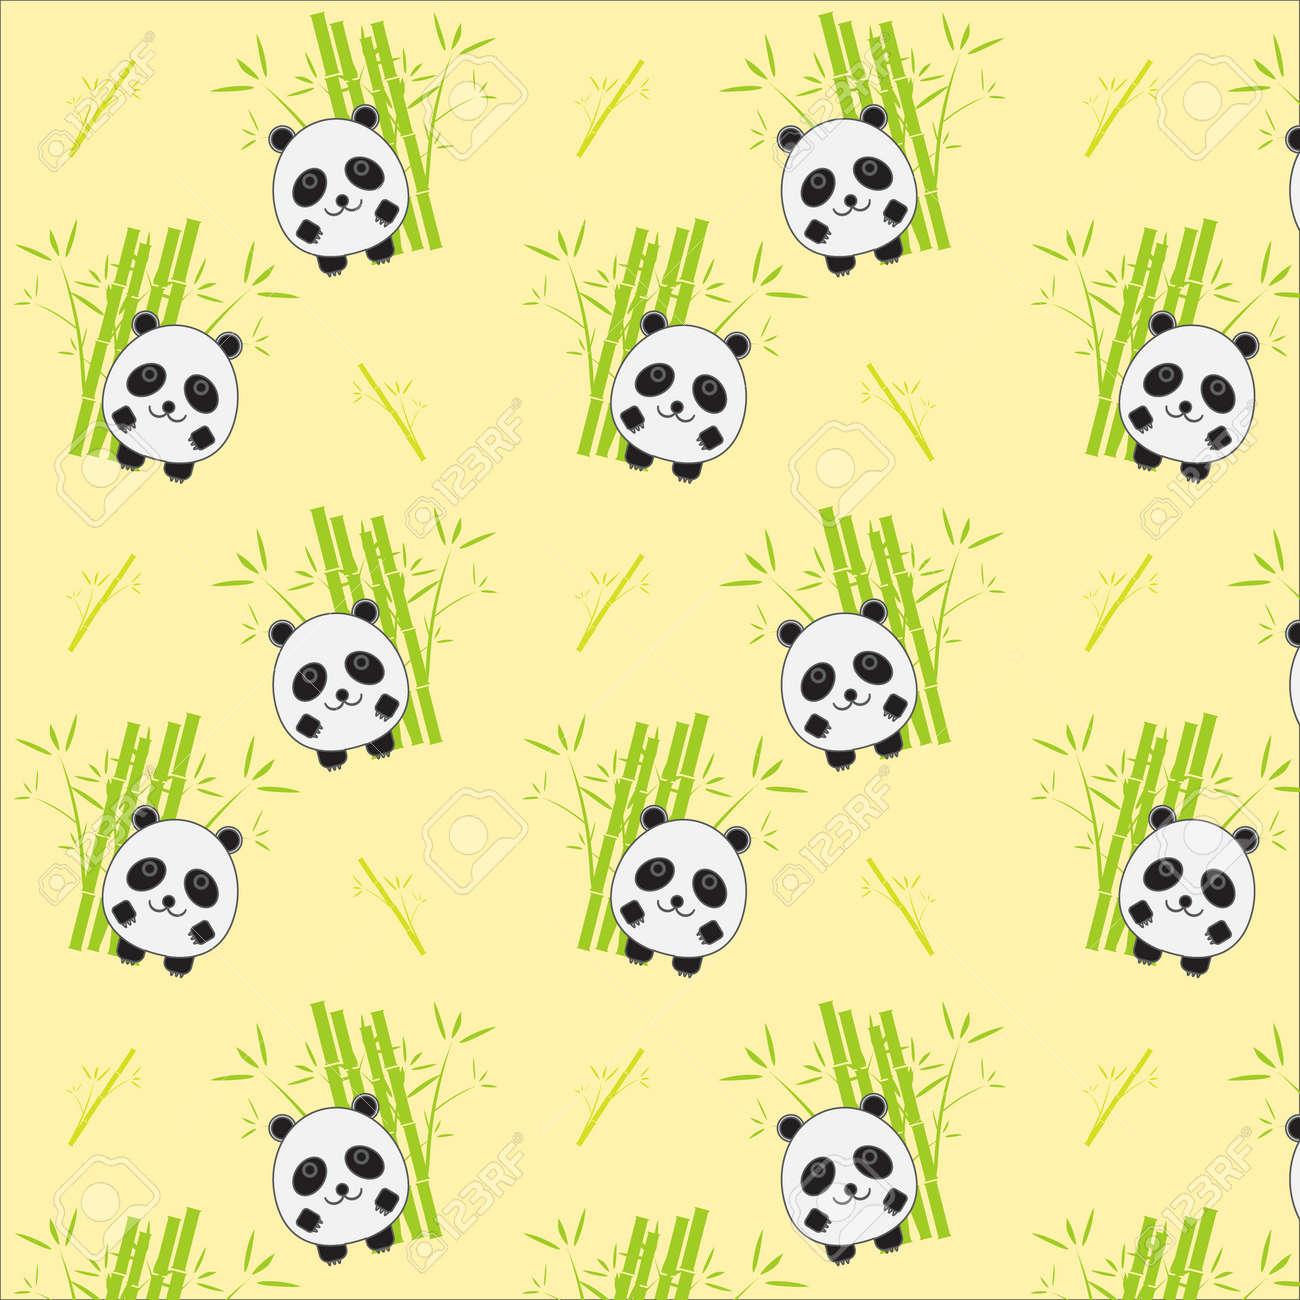 Seamless Background With Cartoon Panda Illustration Panda And